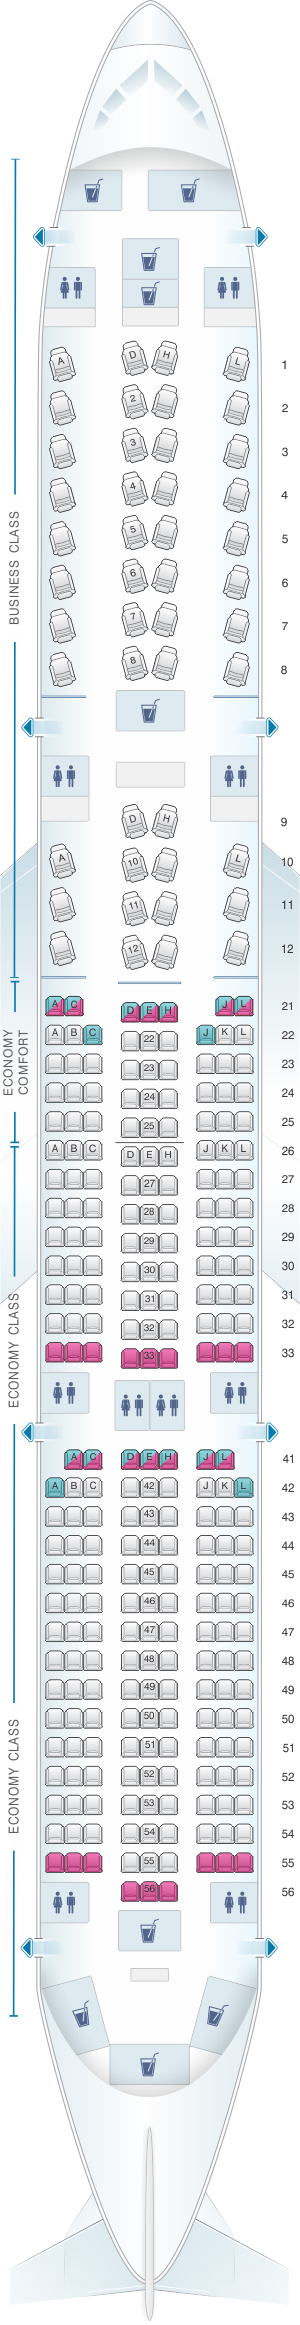 Seat map for Finnair Airbus A350 900 Config.1